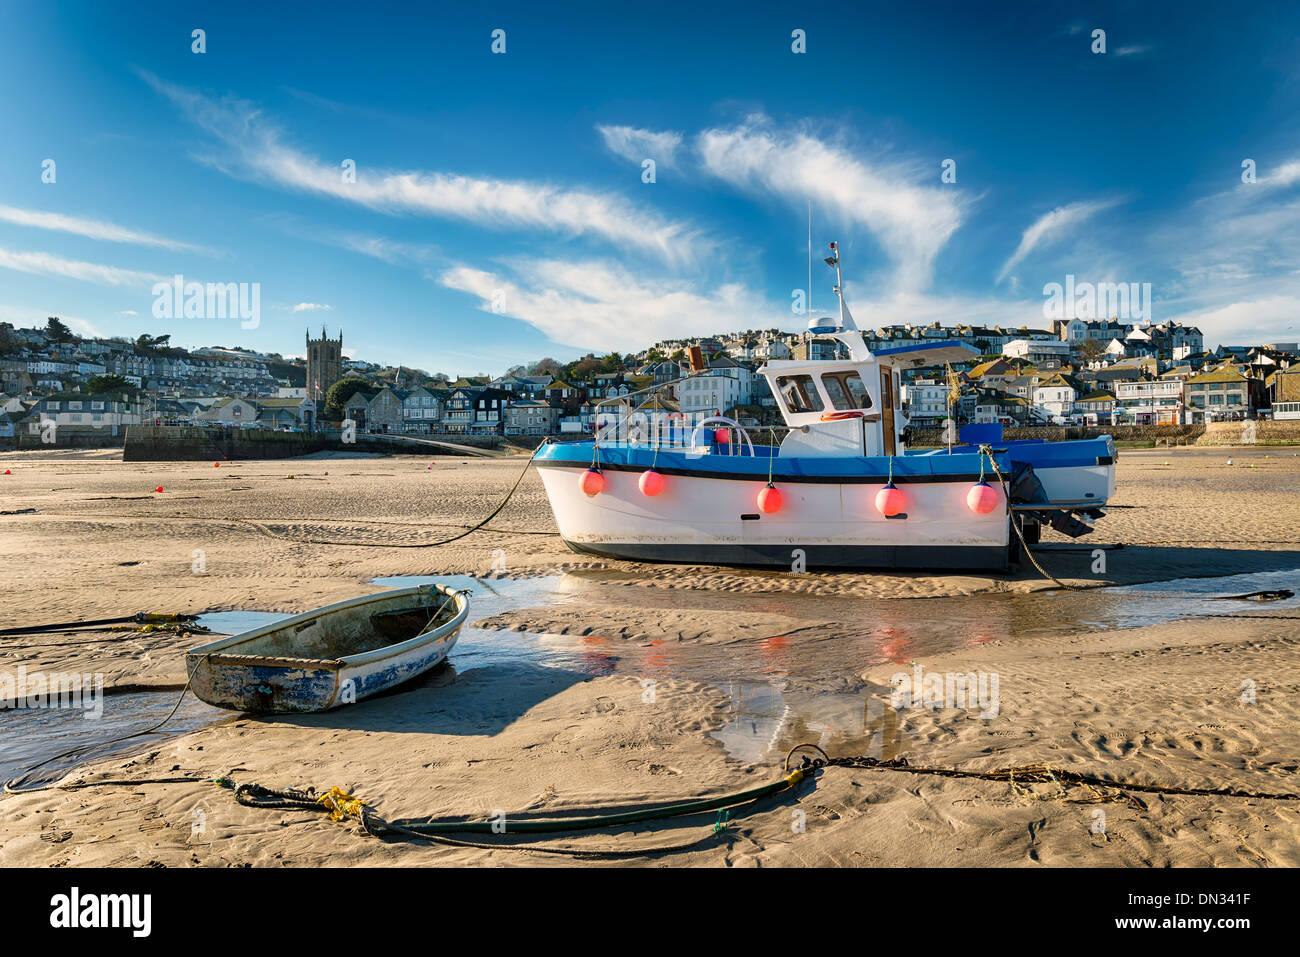 Angelboote/Fischerboote am Strand in St Ives in Cornwall Stockbild